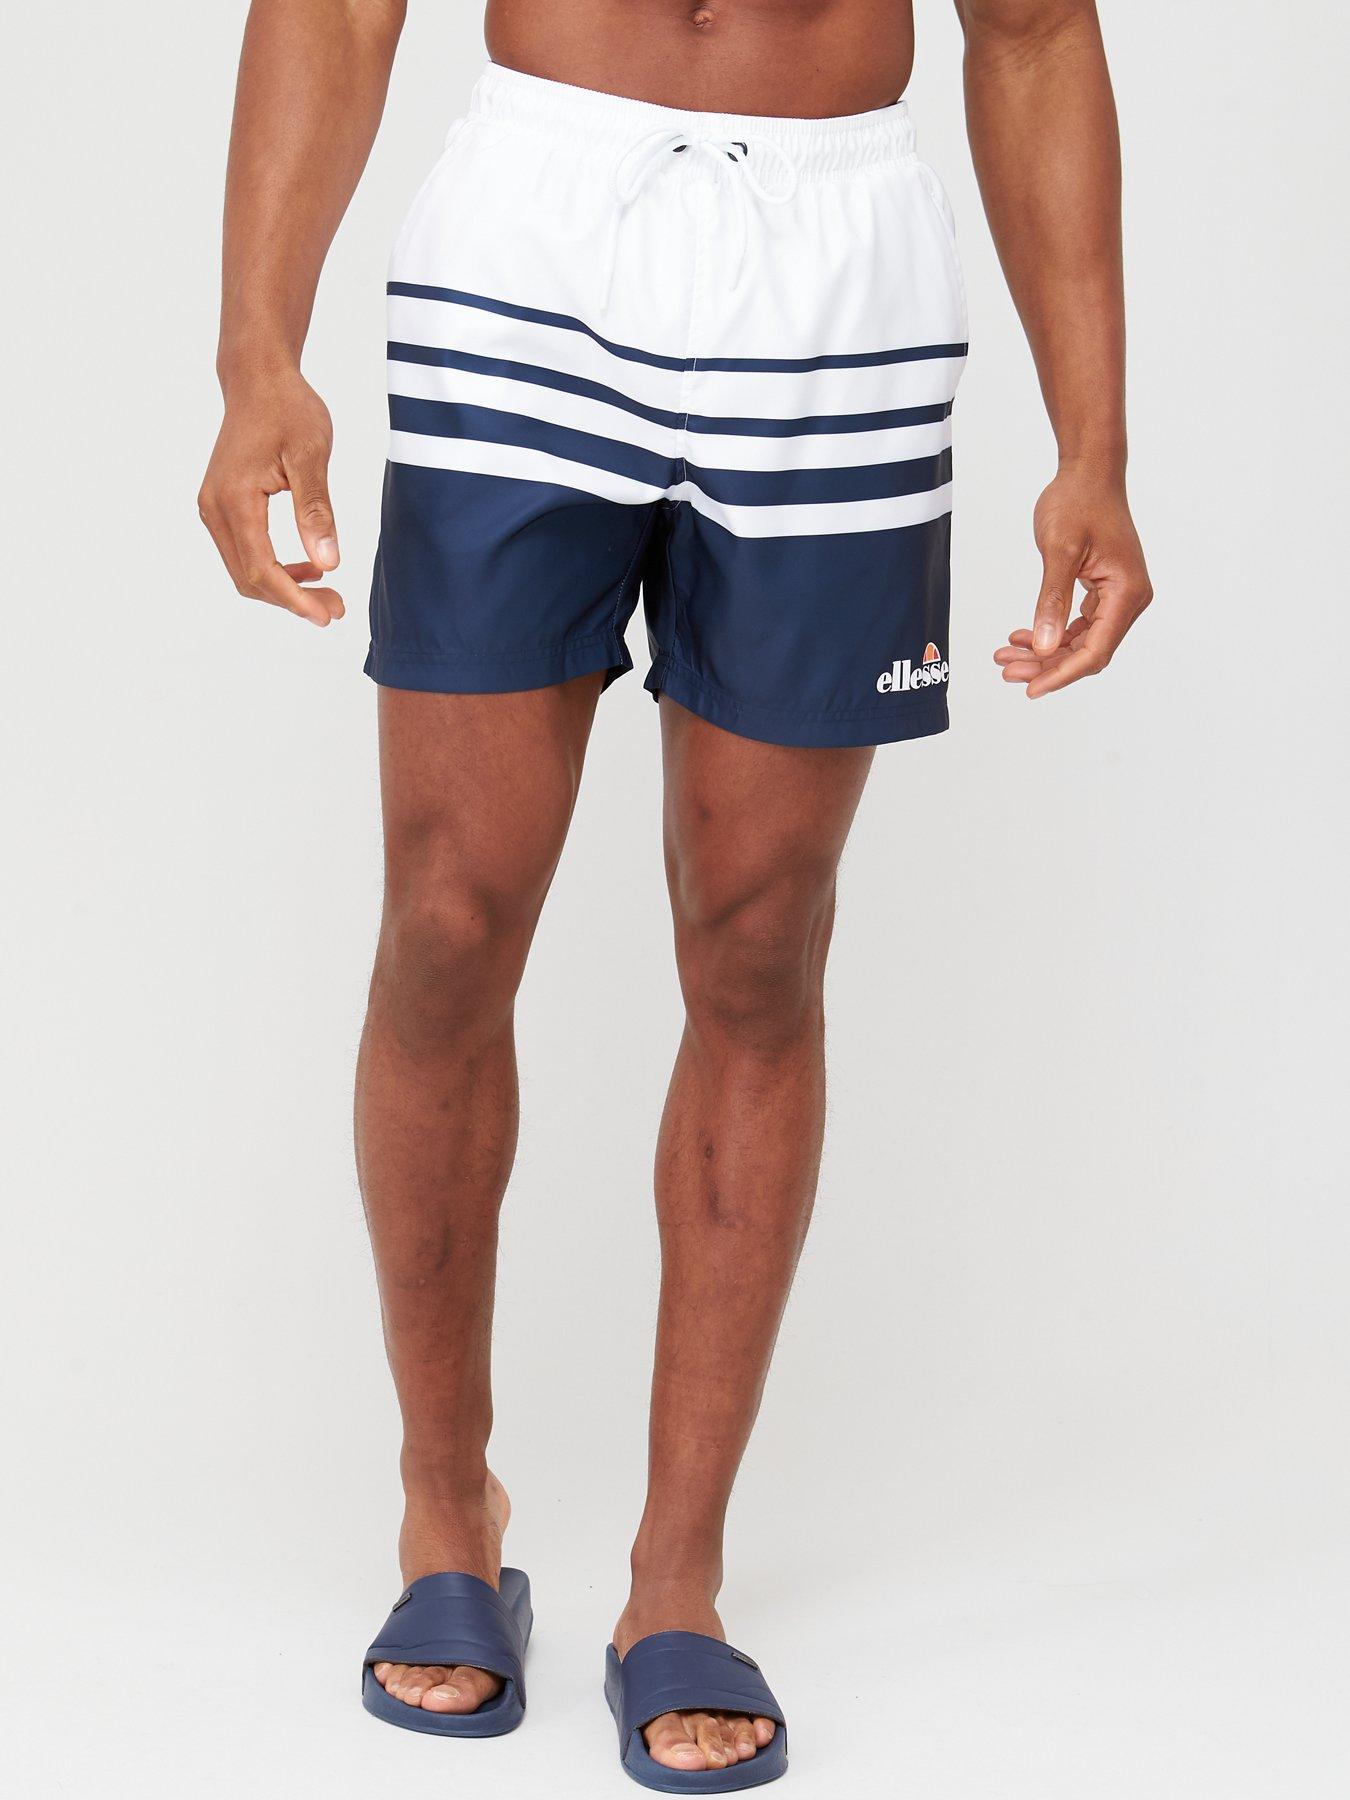 Camp Vibes Mens Swim Trunks Bathing Suit Beach Shorts